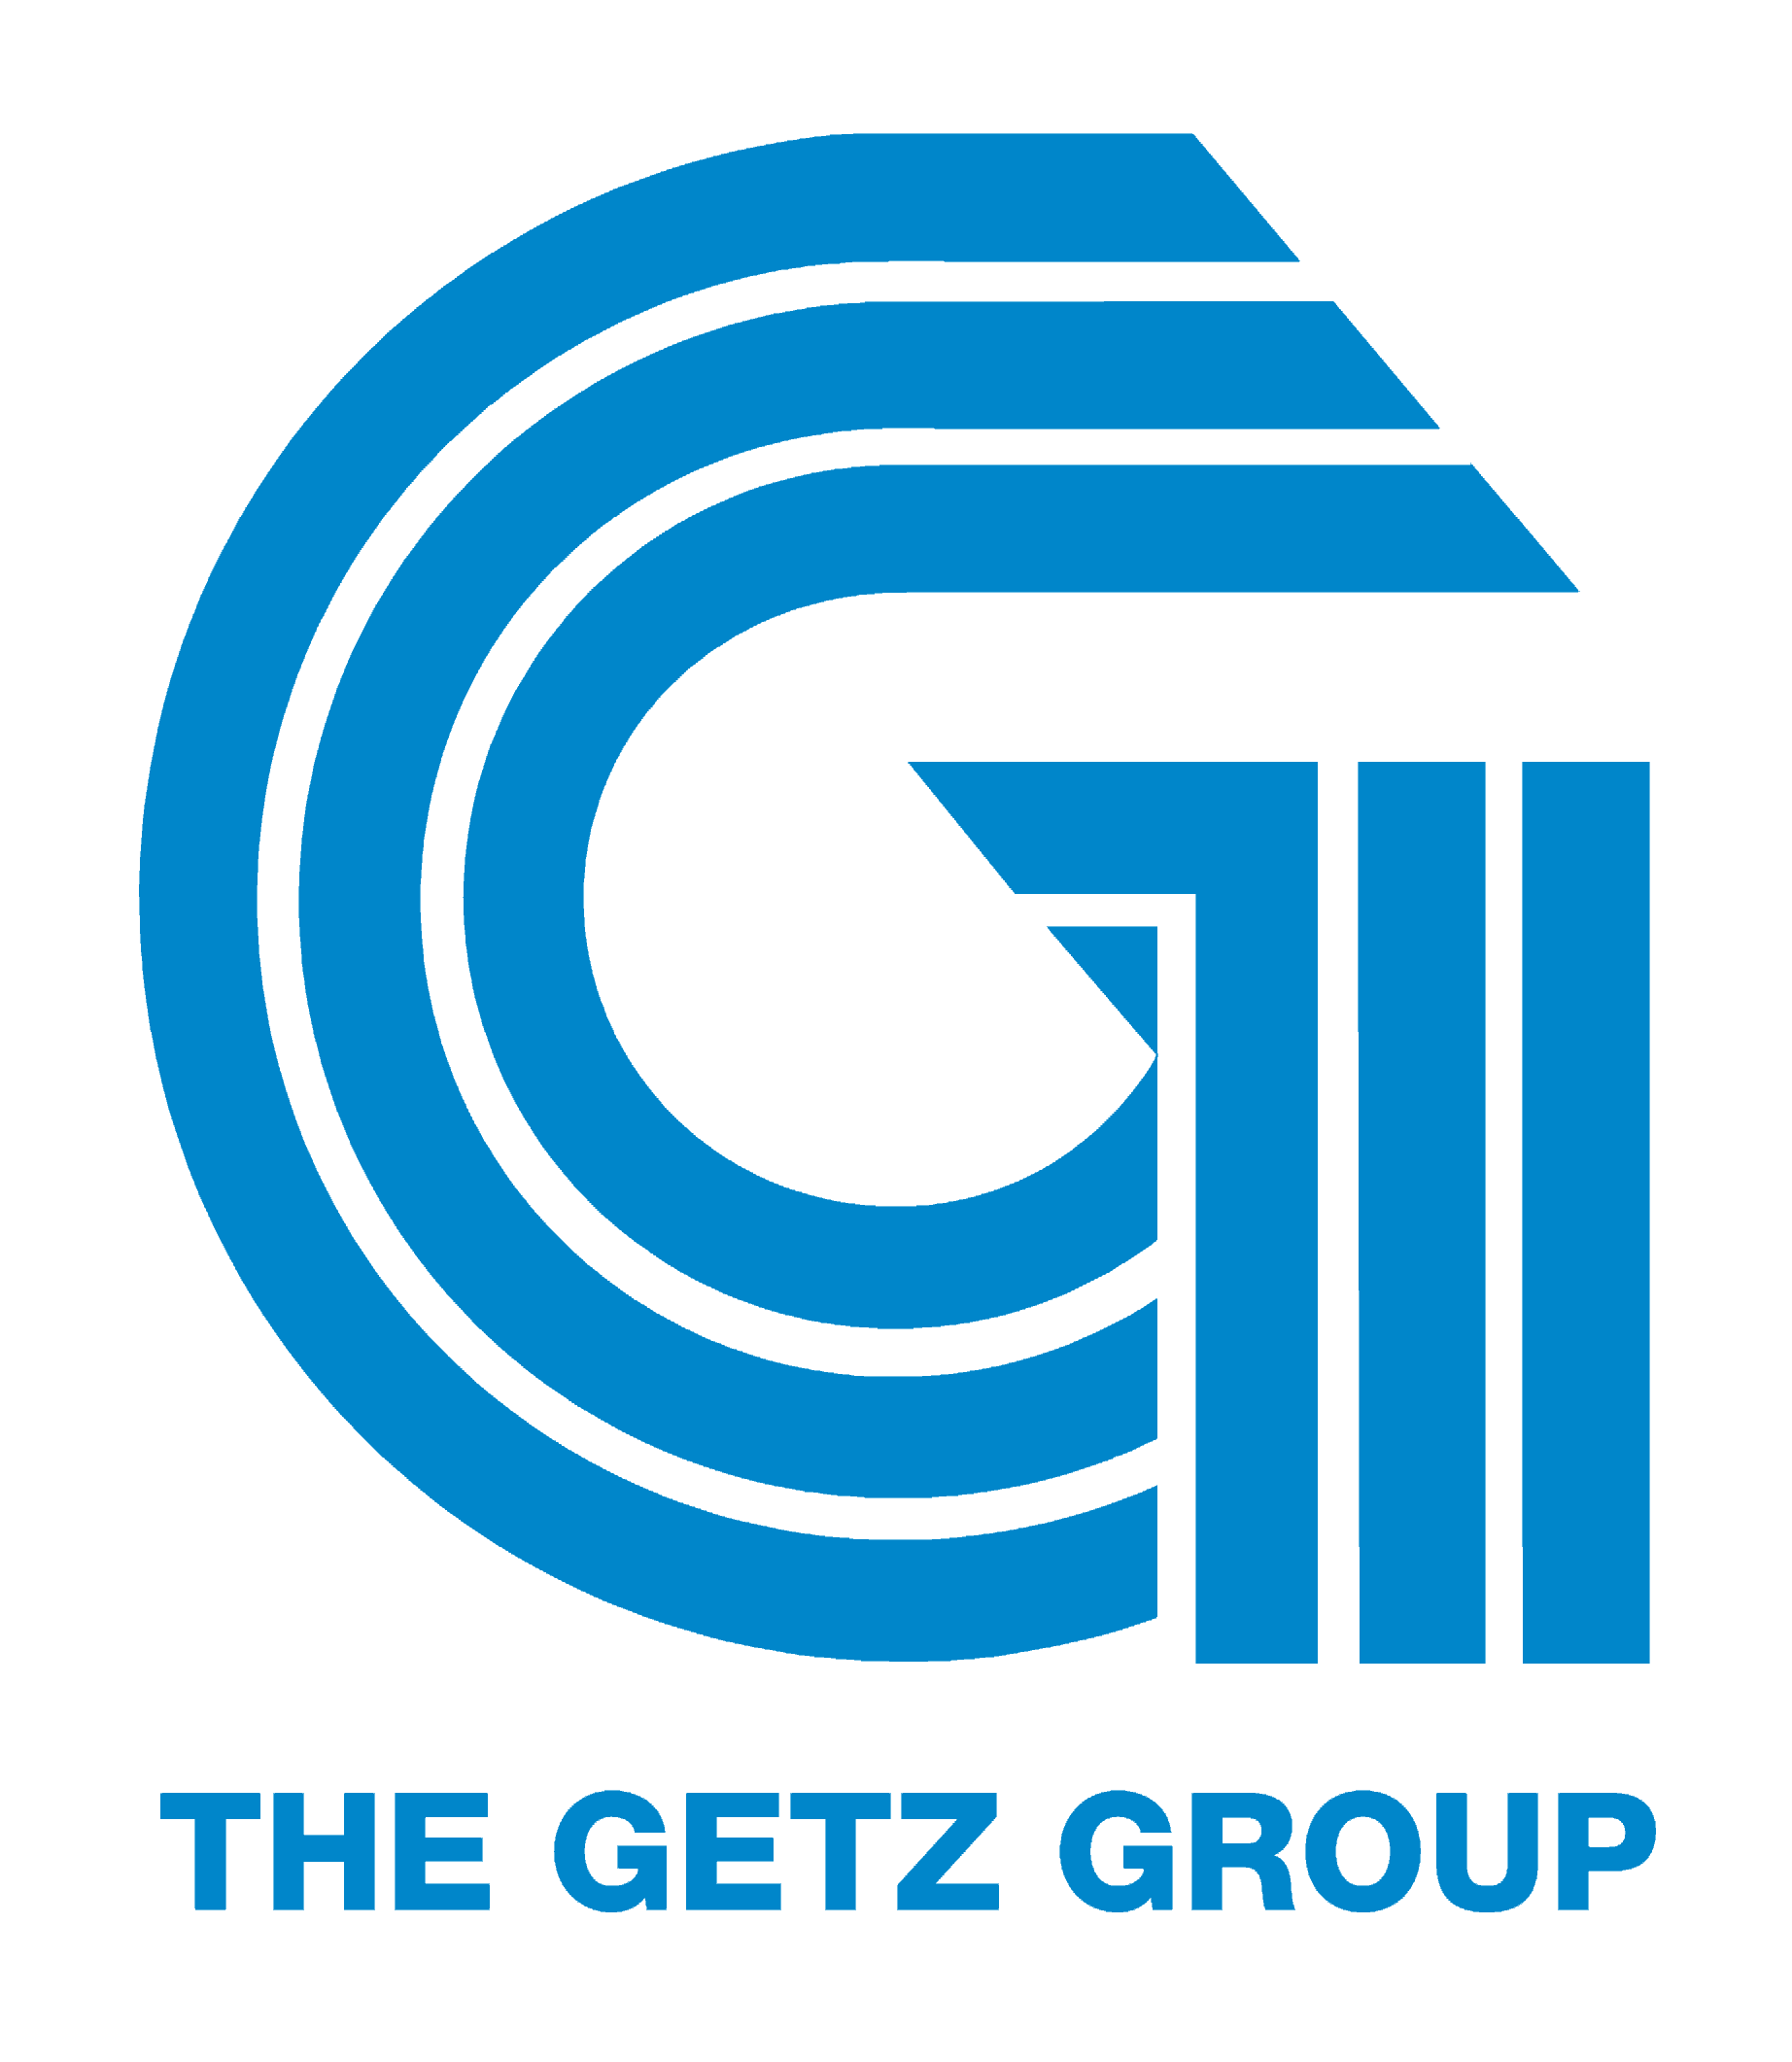 Getz Group